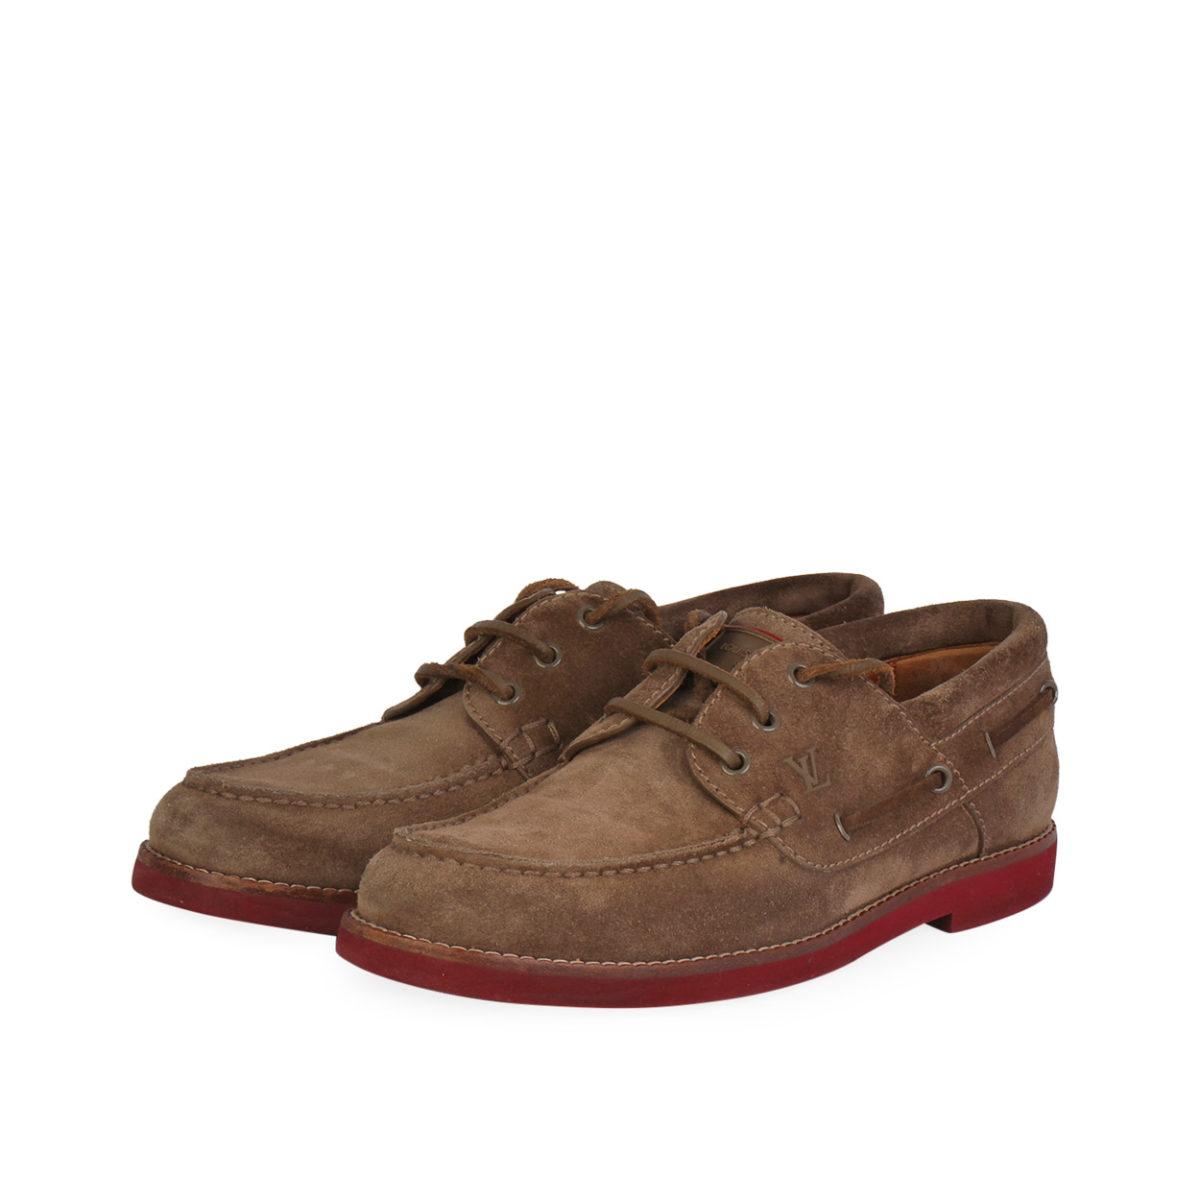 366da00b63be LOUIS VUITTON Suede Men s Boat Sneakers Brown - S  40.5 (7)